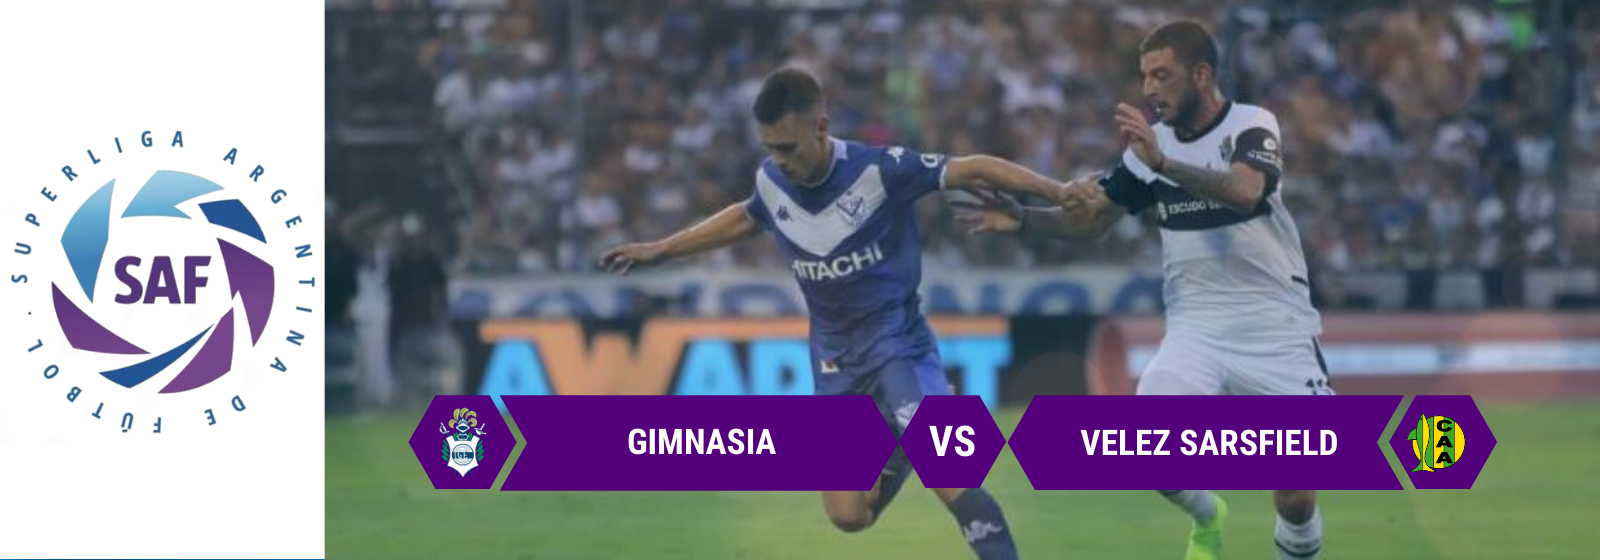 Asianconnect: Gimnasia vs Velez Odds for January 24, 2020